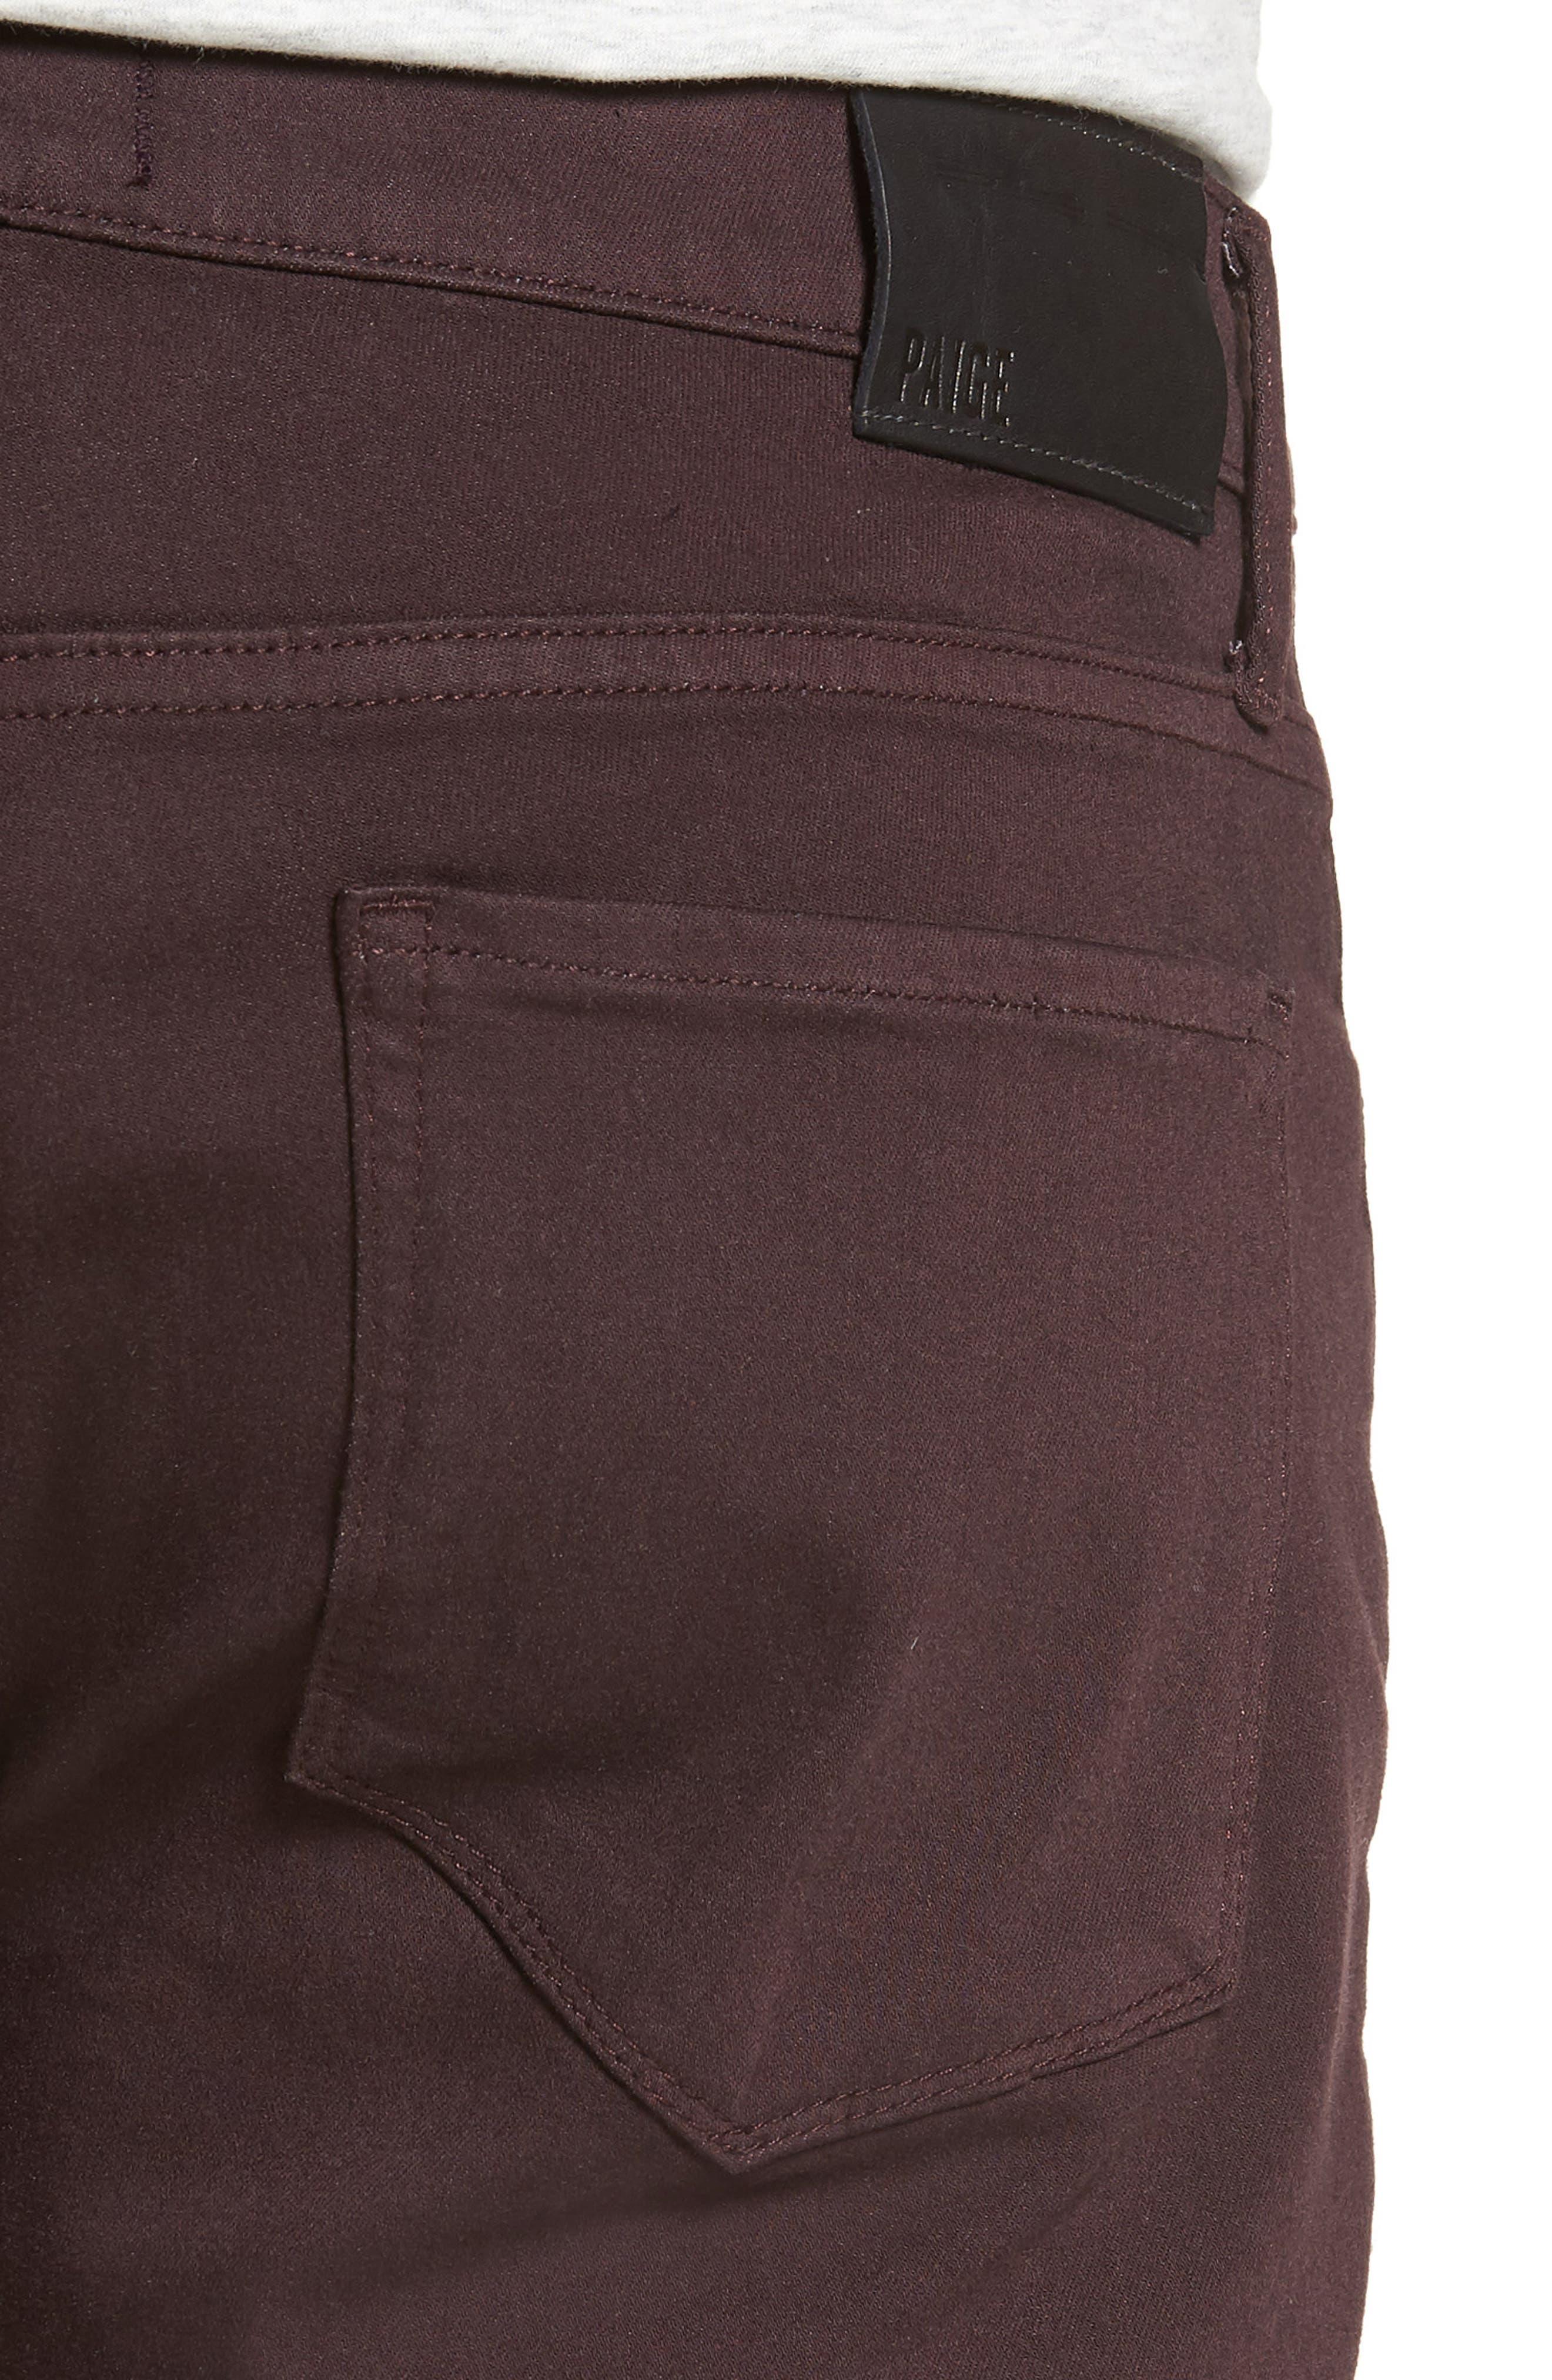 Transcend - Federal Slim Straight Fit Jeans,                             Alternate thumbnail 4, color,                             DARK PORT